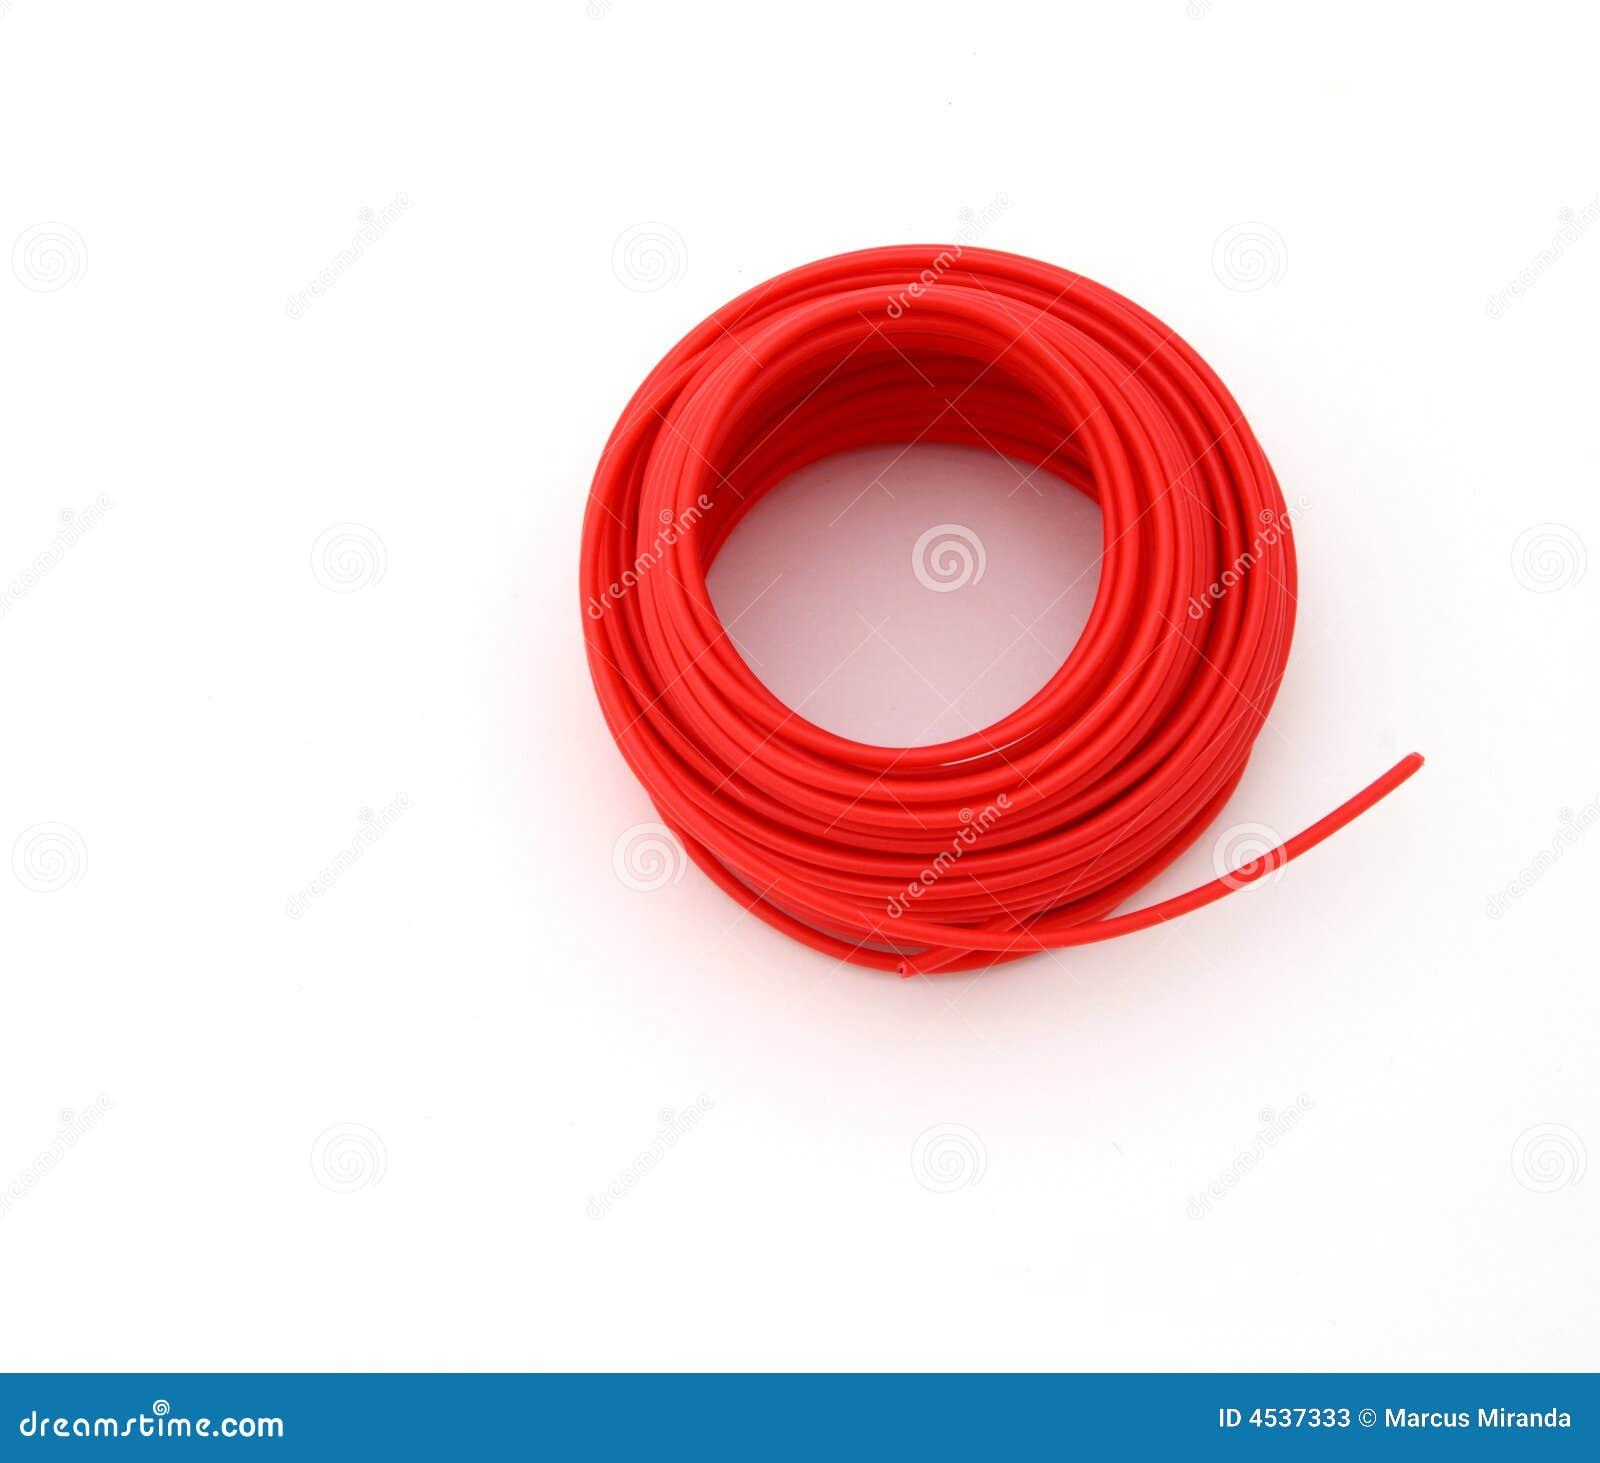 Roter Draht stockbild. Bild von boden, draht, wunde, weiß - 4537333